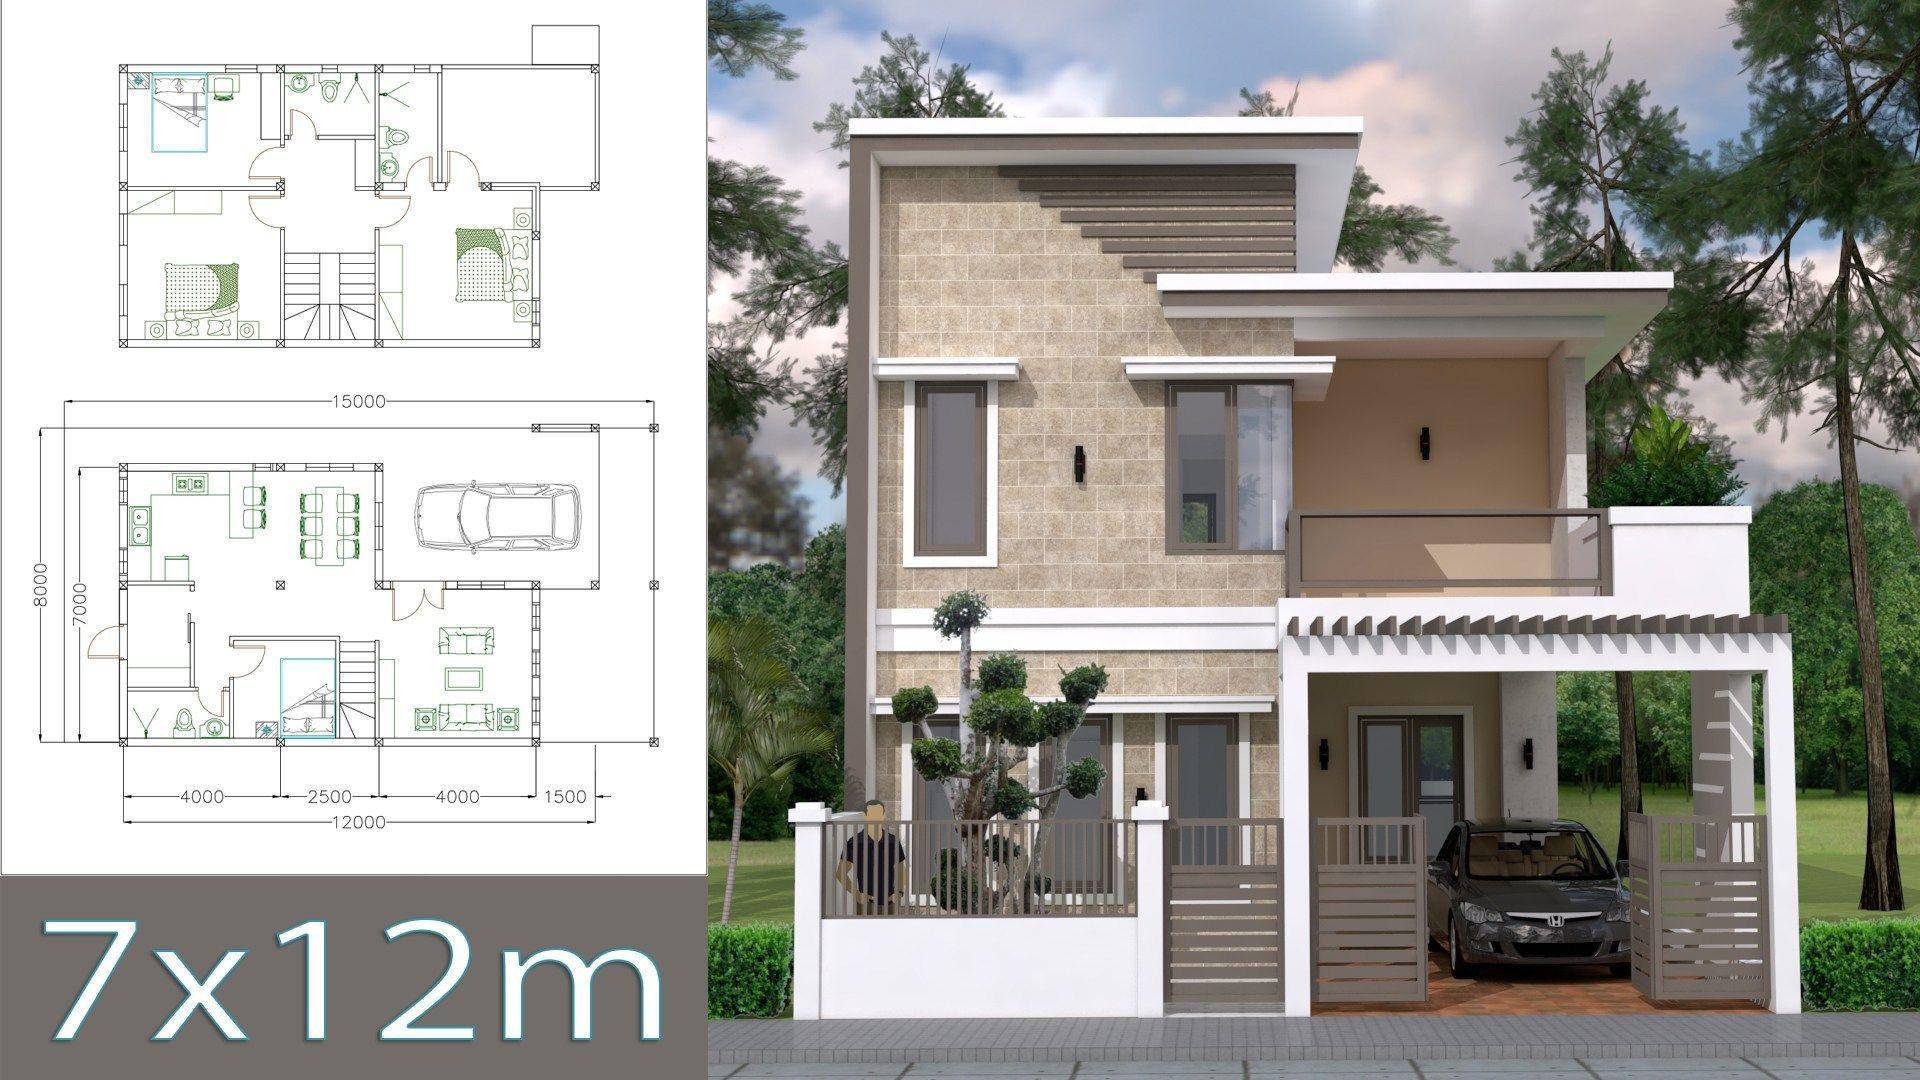 Home Design Plan 7x12m With 4 Bedrooms Plot 8x15 Plan Maison